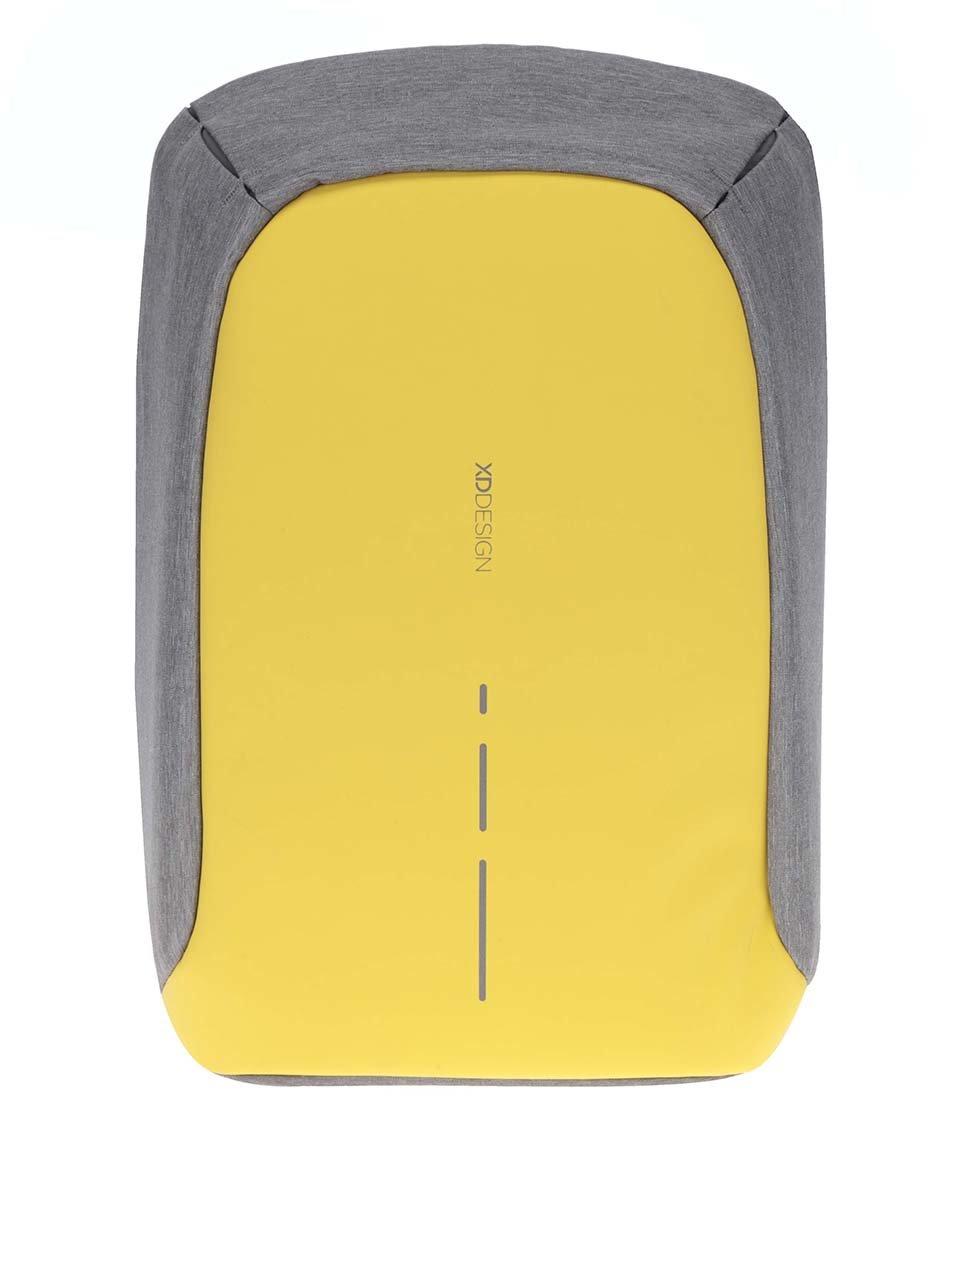 Šedo-žlutý nevykradnutelný unisex batoh XD Design Bobby